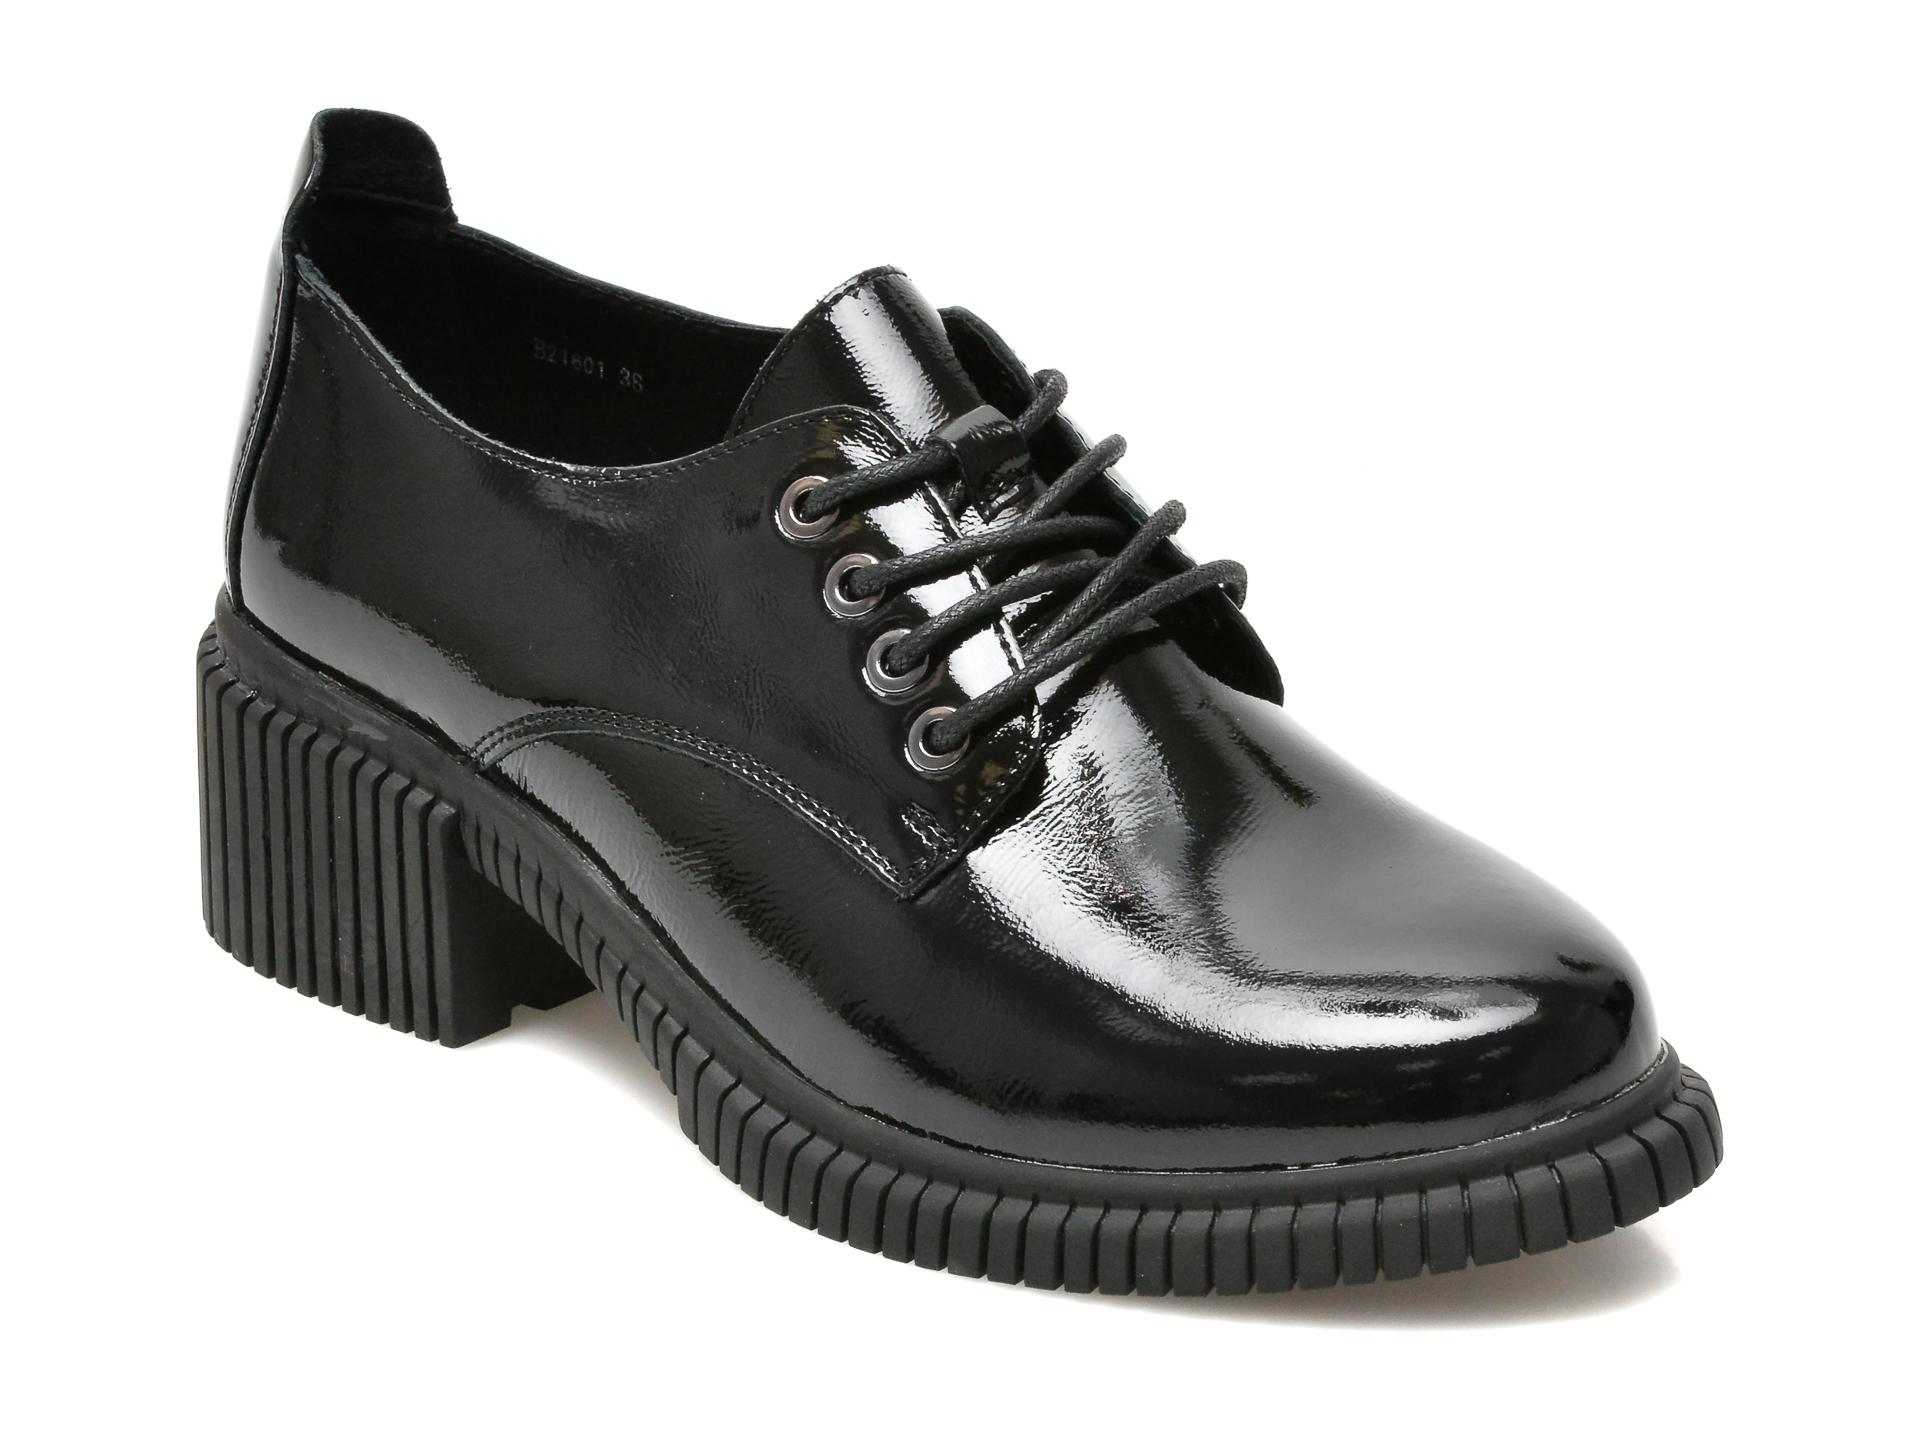 Pantofi Flavia Passini Negri, B21601, Din Piele Naturala Lacuita